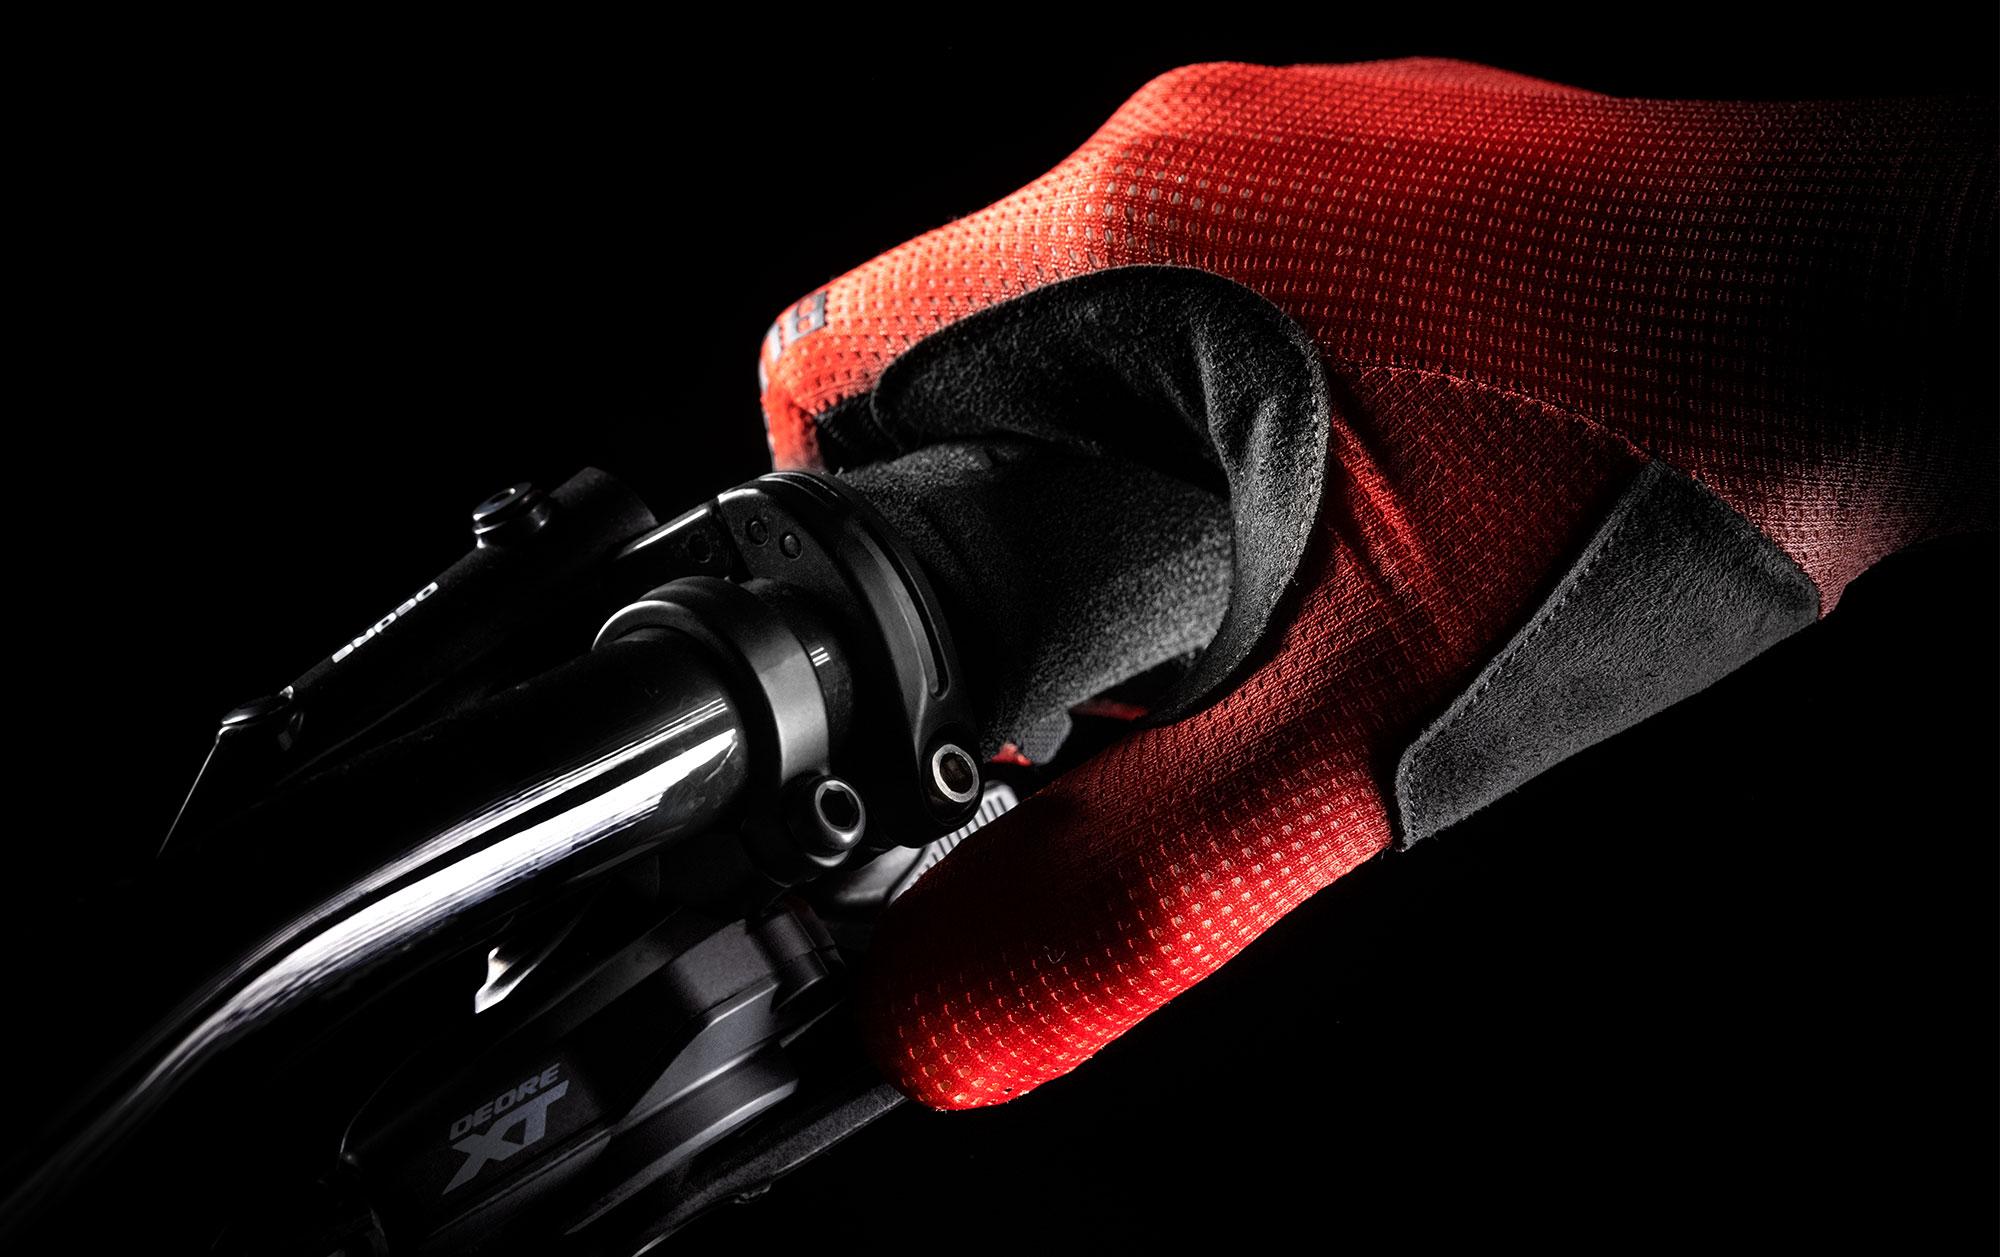 Bluegrass Vapor Lite MTB Glove for Trail, Cross Country and E-MTB